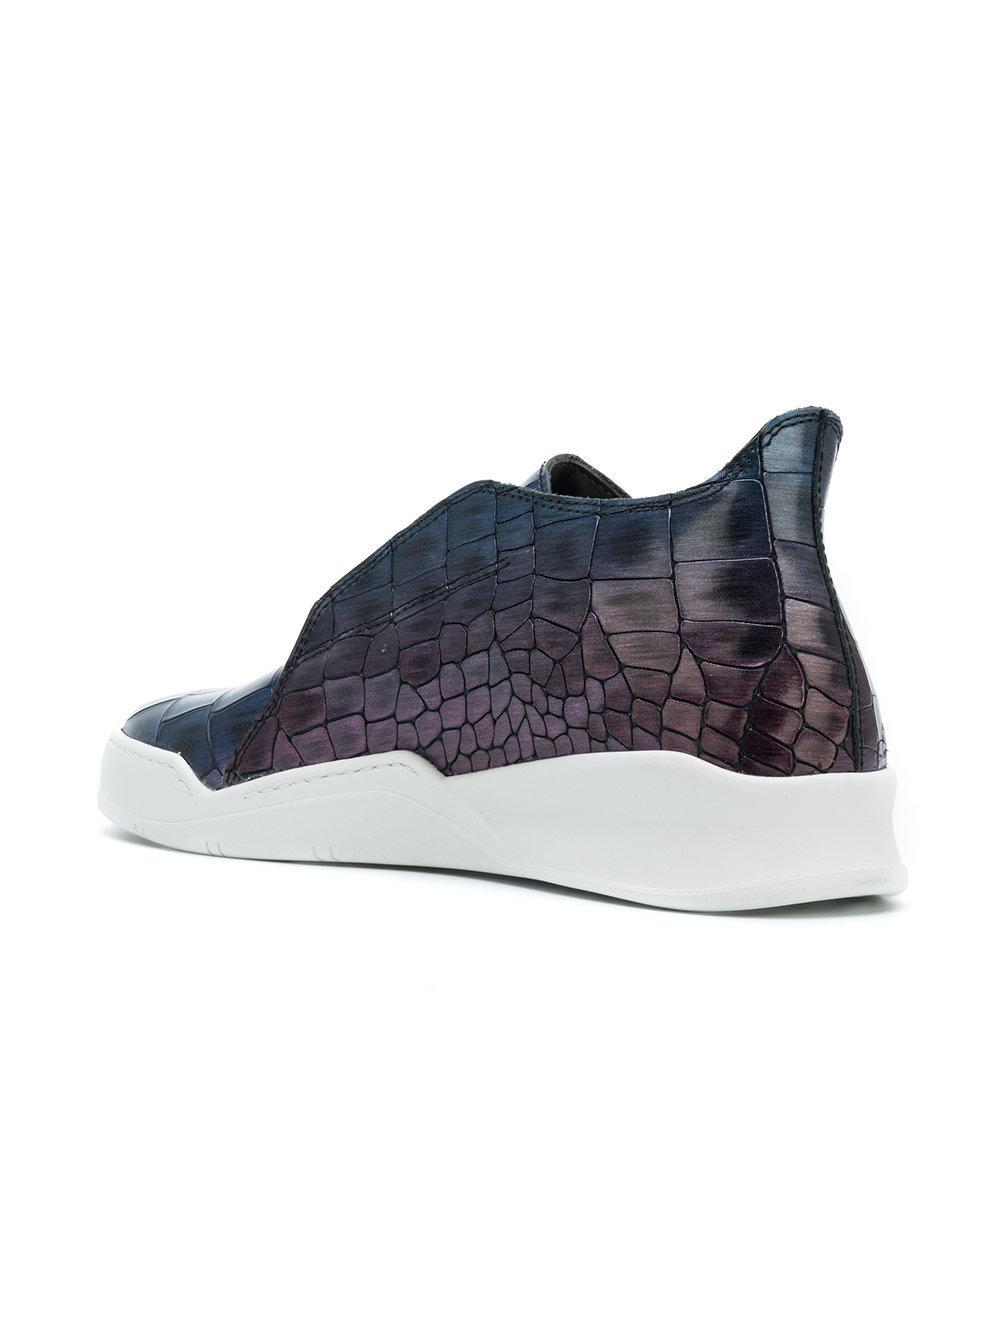 hi-top croc effect sneakers - Blue Last Sole xIJW1vtpfw